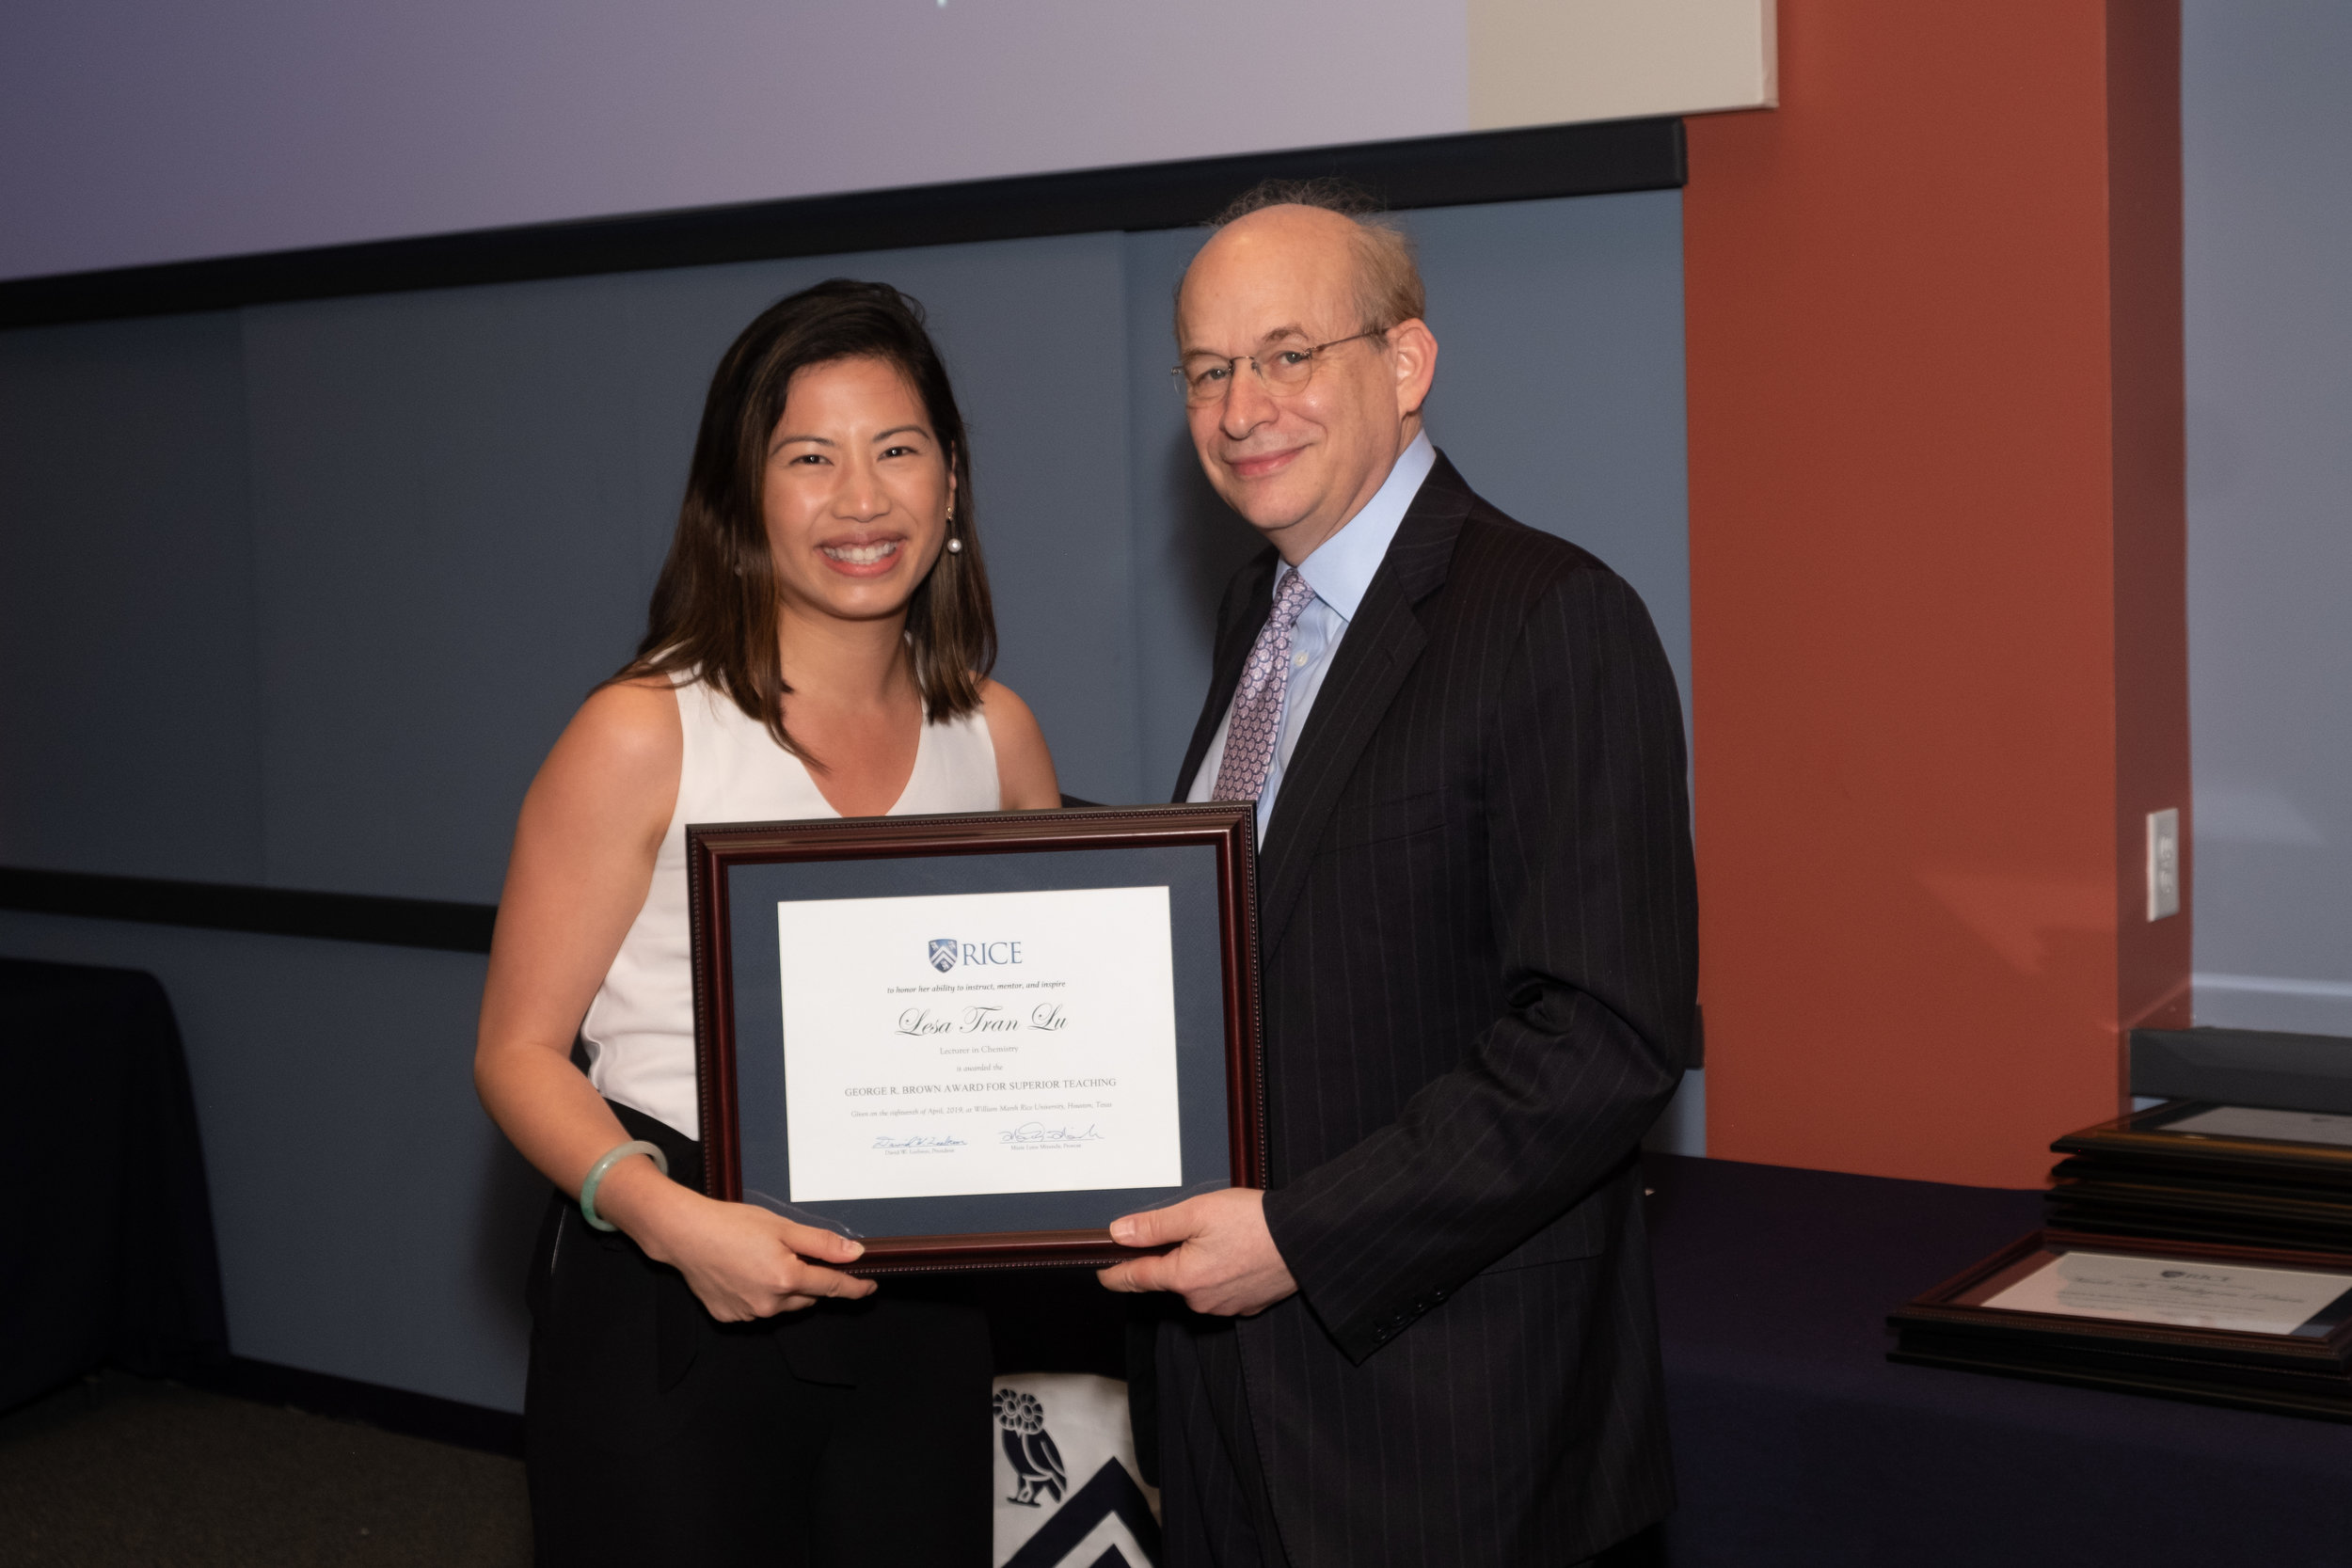 President Leebron & Lesa Tran Lu, George R. Brown Award for Superior Teaching